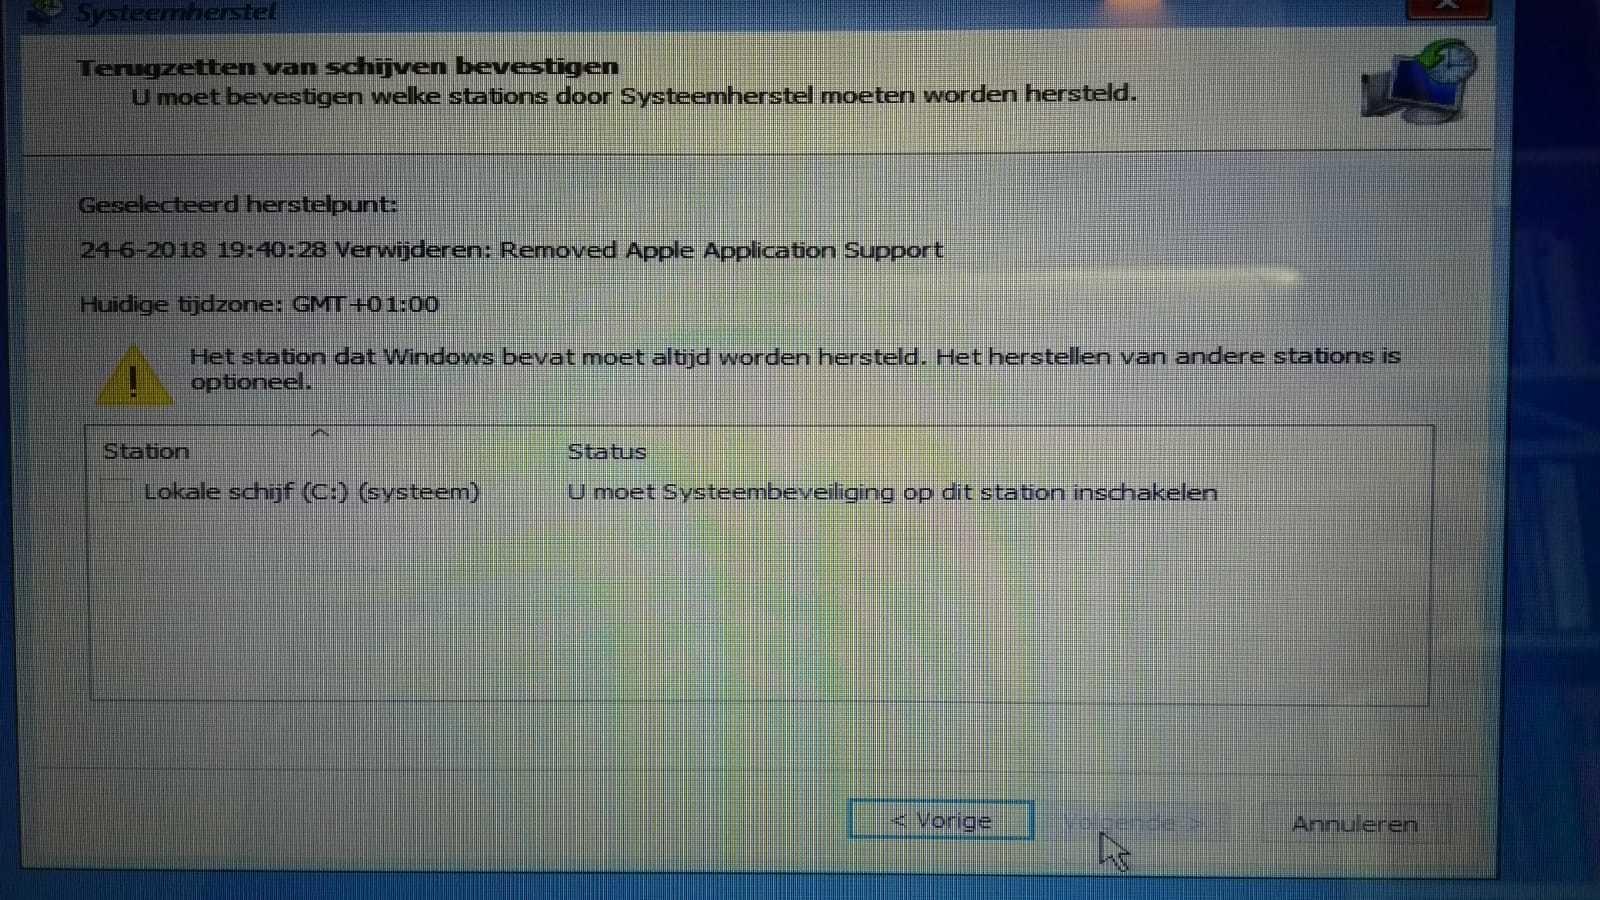 Windows 10] Ervaringen & Discussie - Deel 2 - Windows